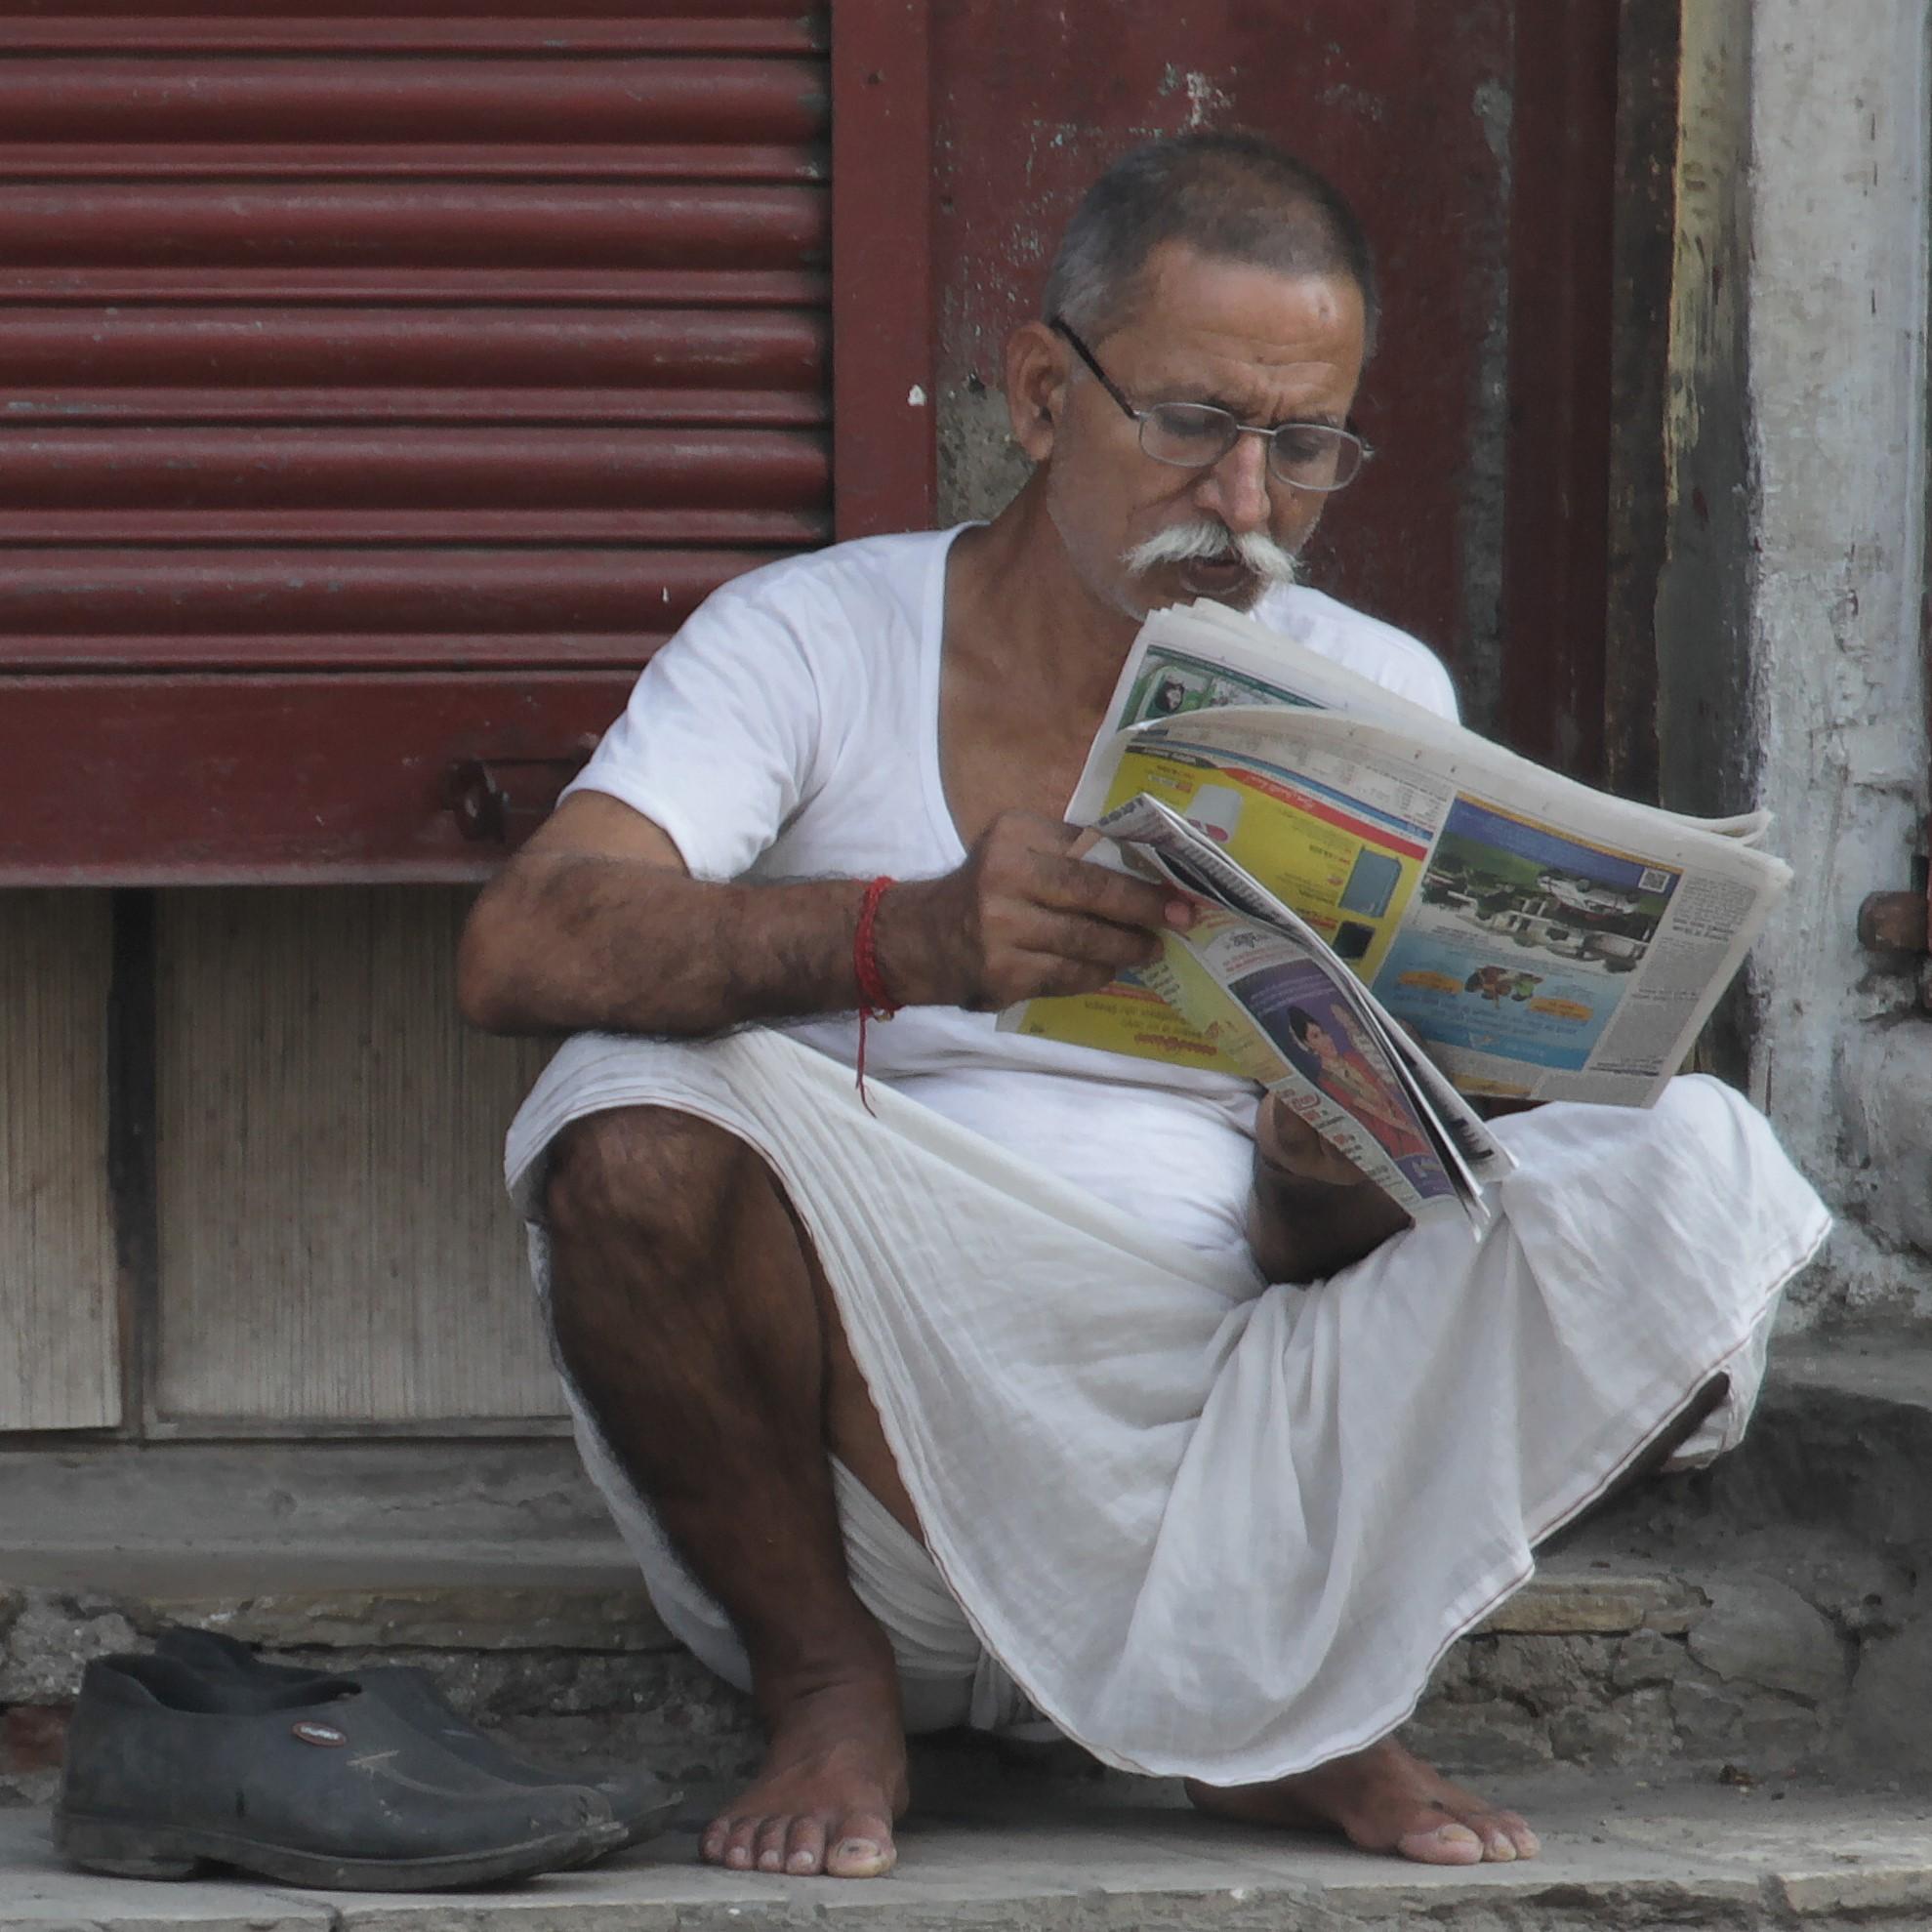 newspaper in the slum